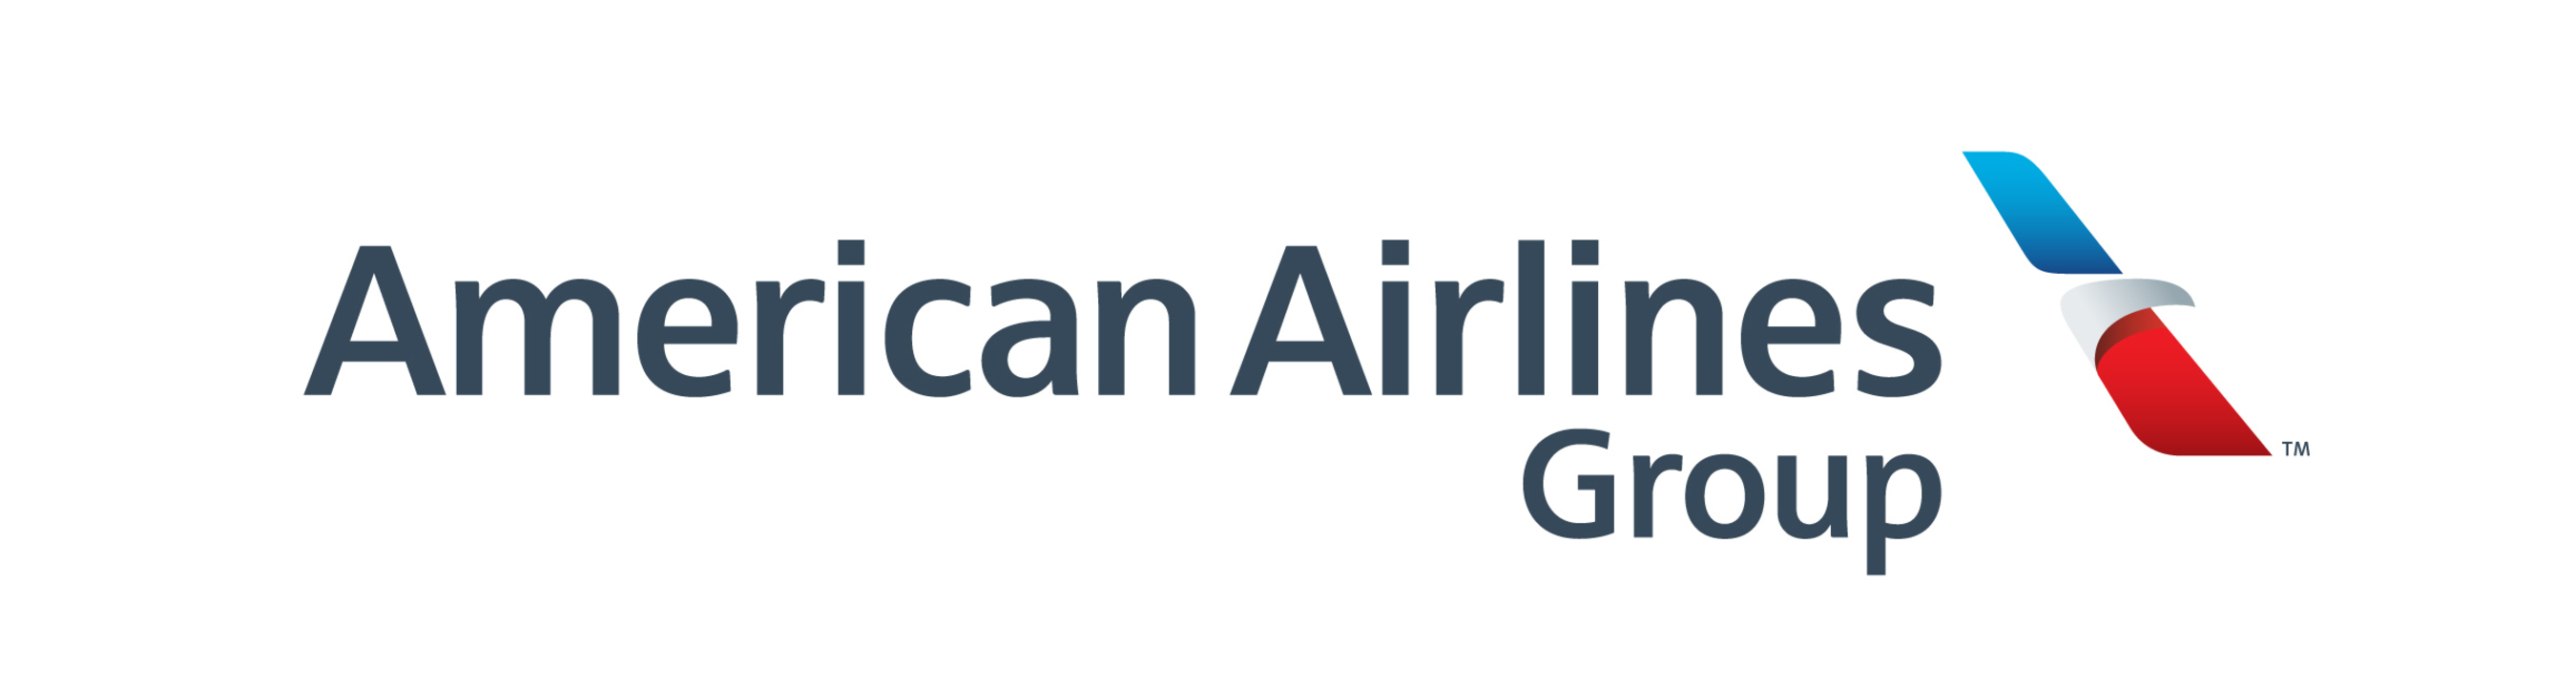 American Airlines Group logo. (PRNewsFoto/American Airlines Group) (PRNewsFoto/American Airlines Group)